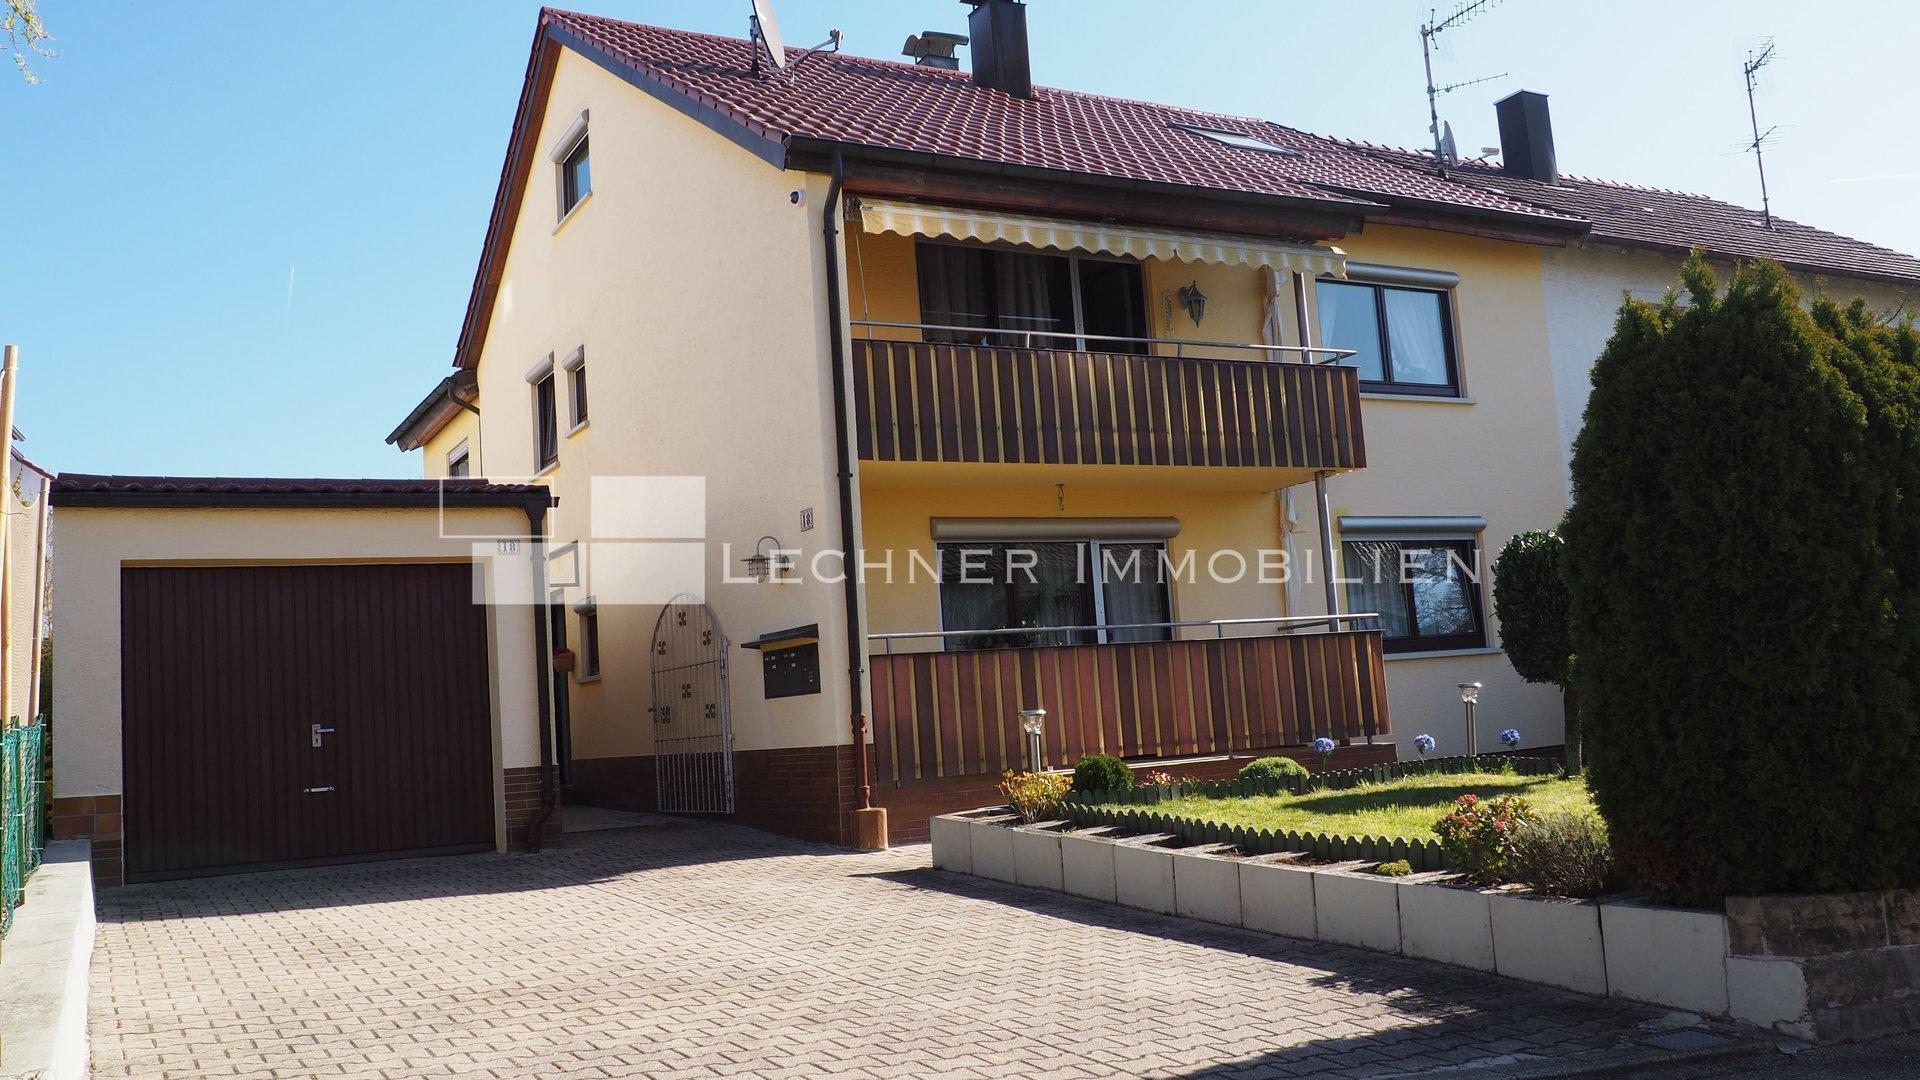 2 familienhaus grossheppach kaufen bei lechner immobilien ludwigsburg. Black Bedroom Furniture Sets. Home Design Ideas